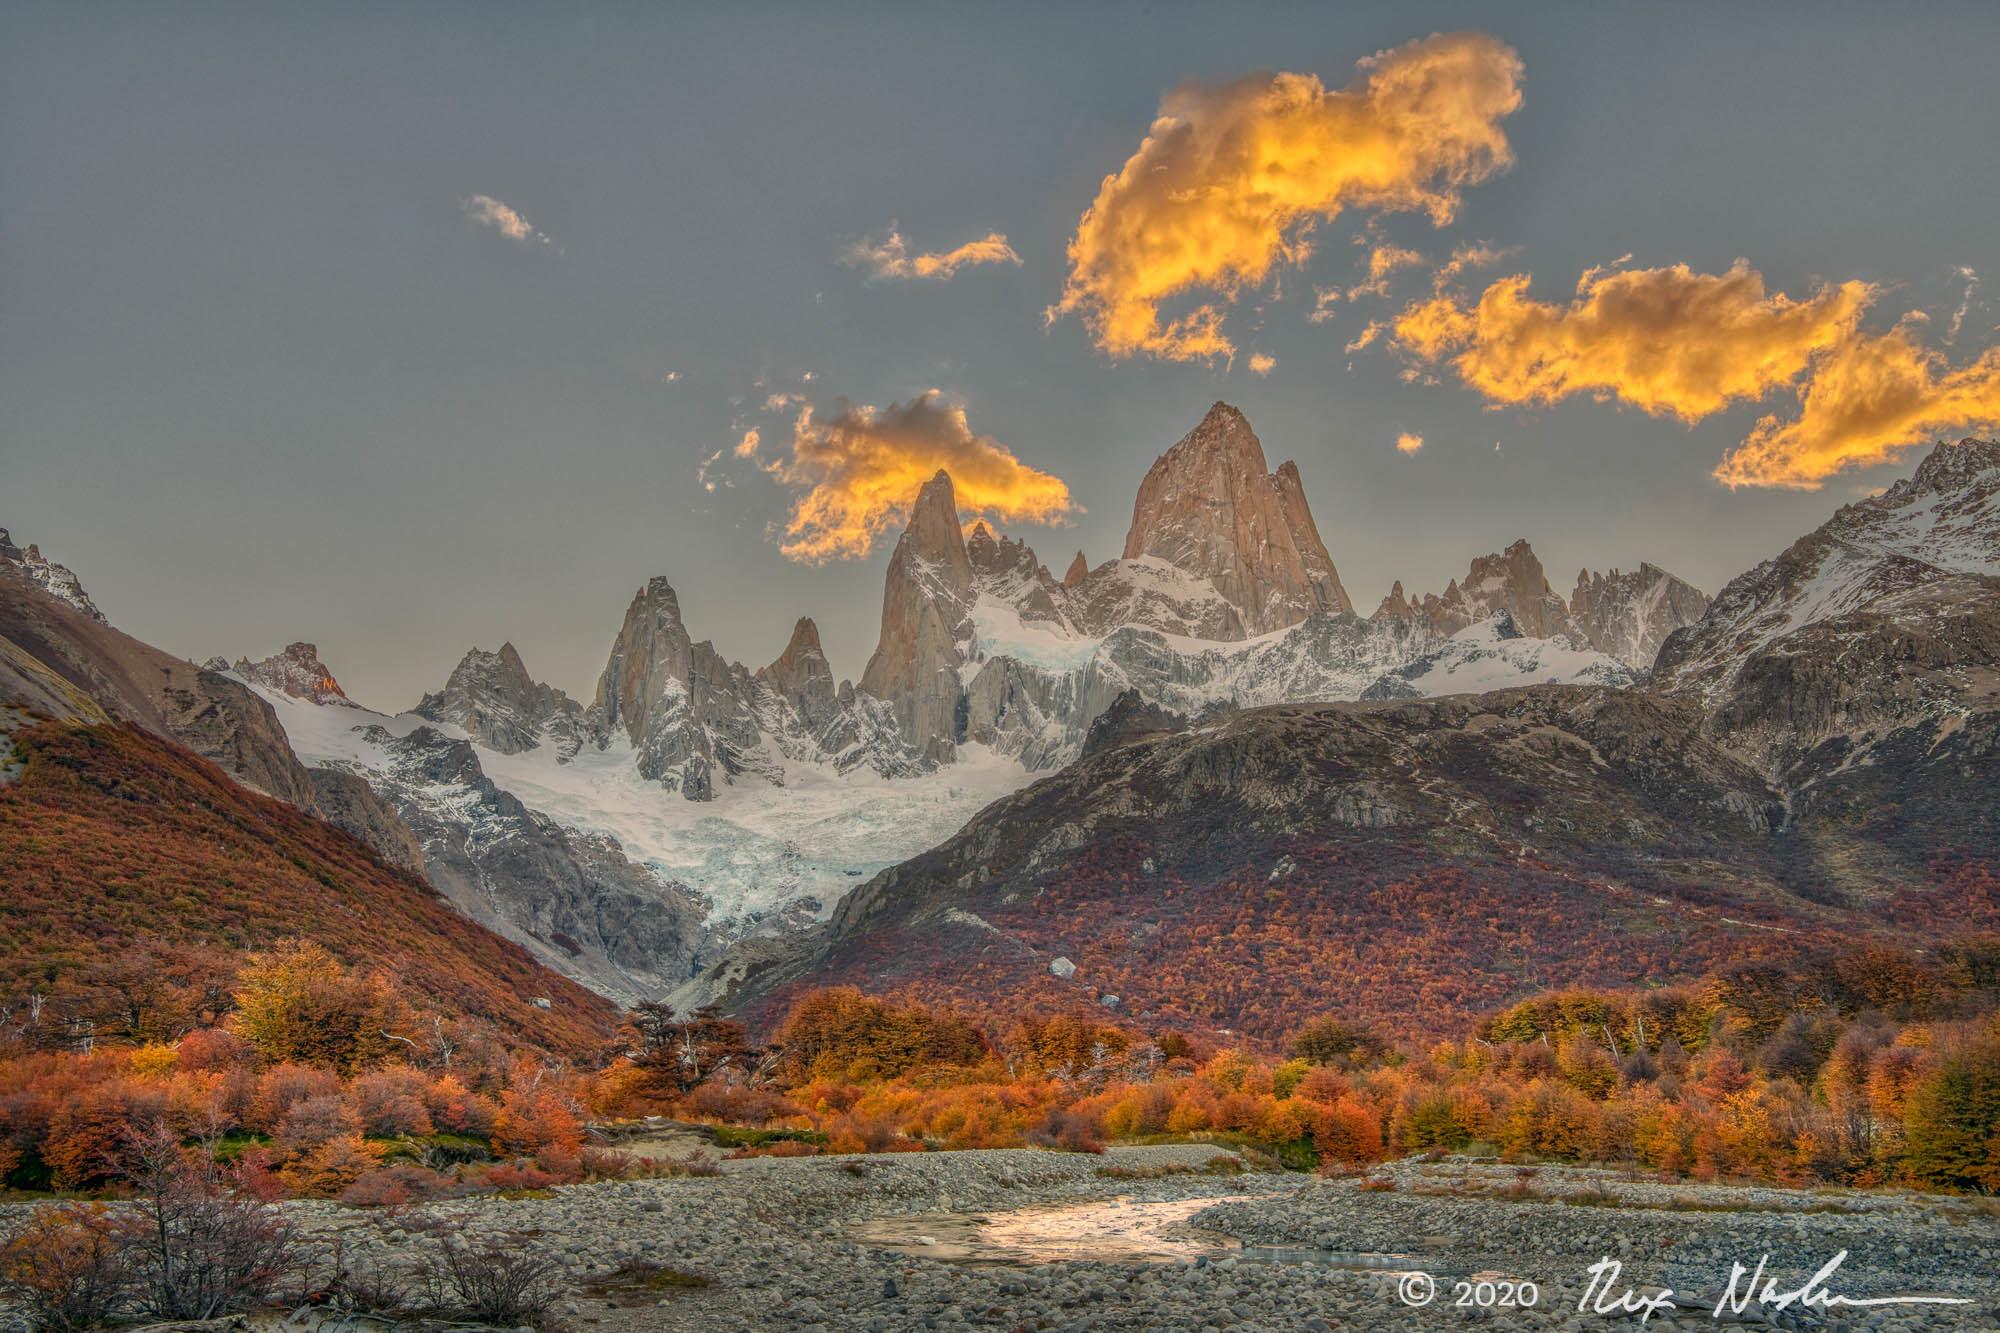 Cloud Cover - Near El Chalten, Argentina